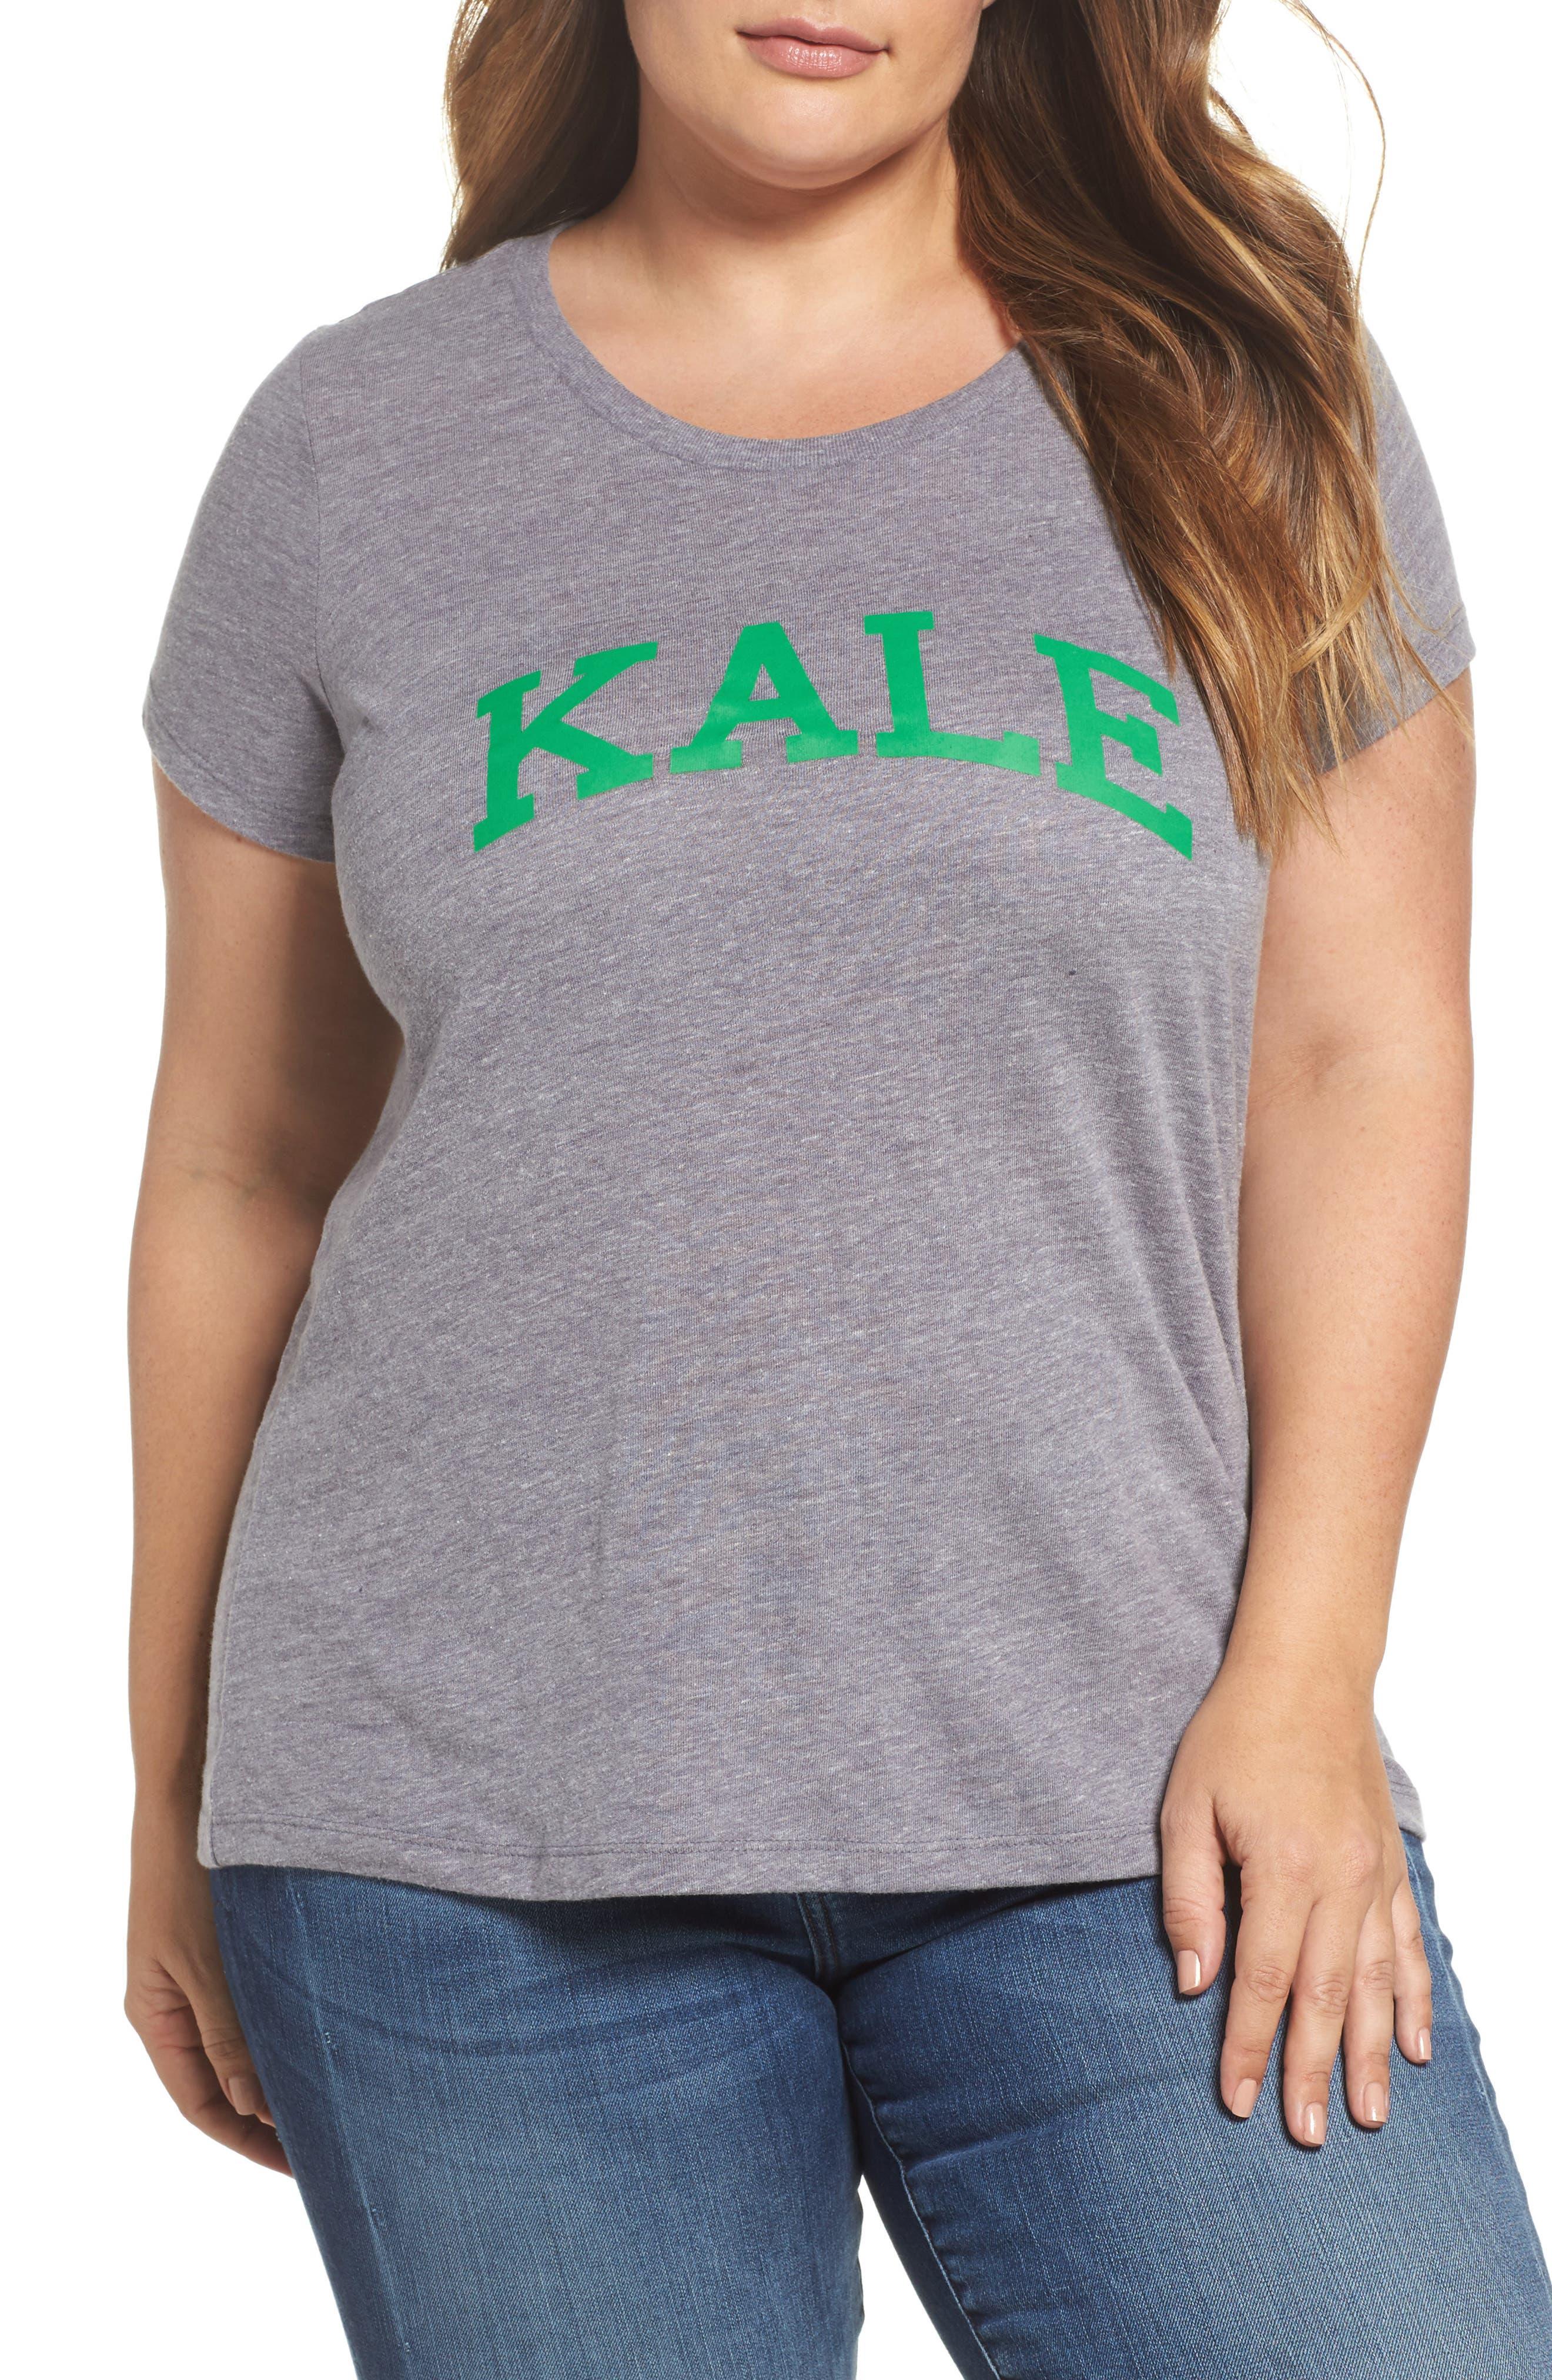 Kale Graphic Tee,                             Main thumbnail 1, color,                             050